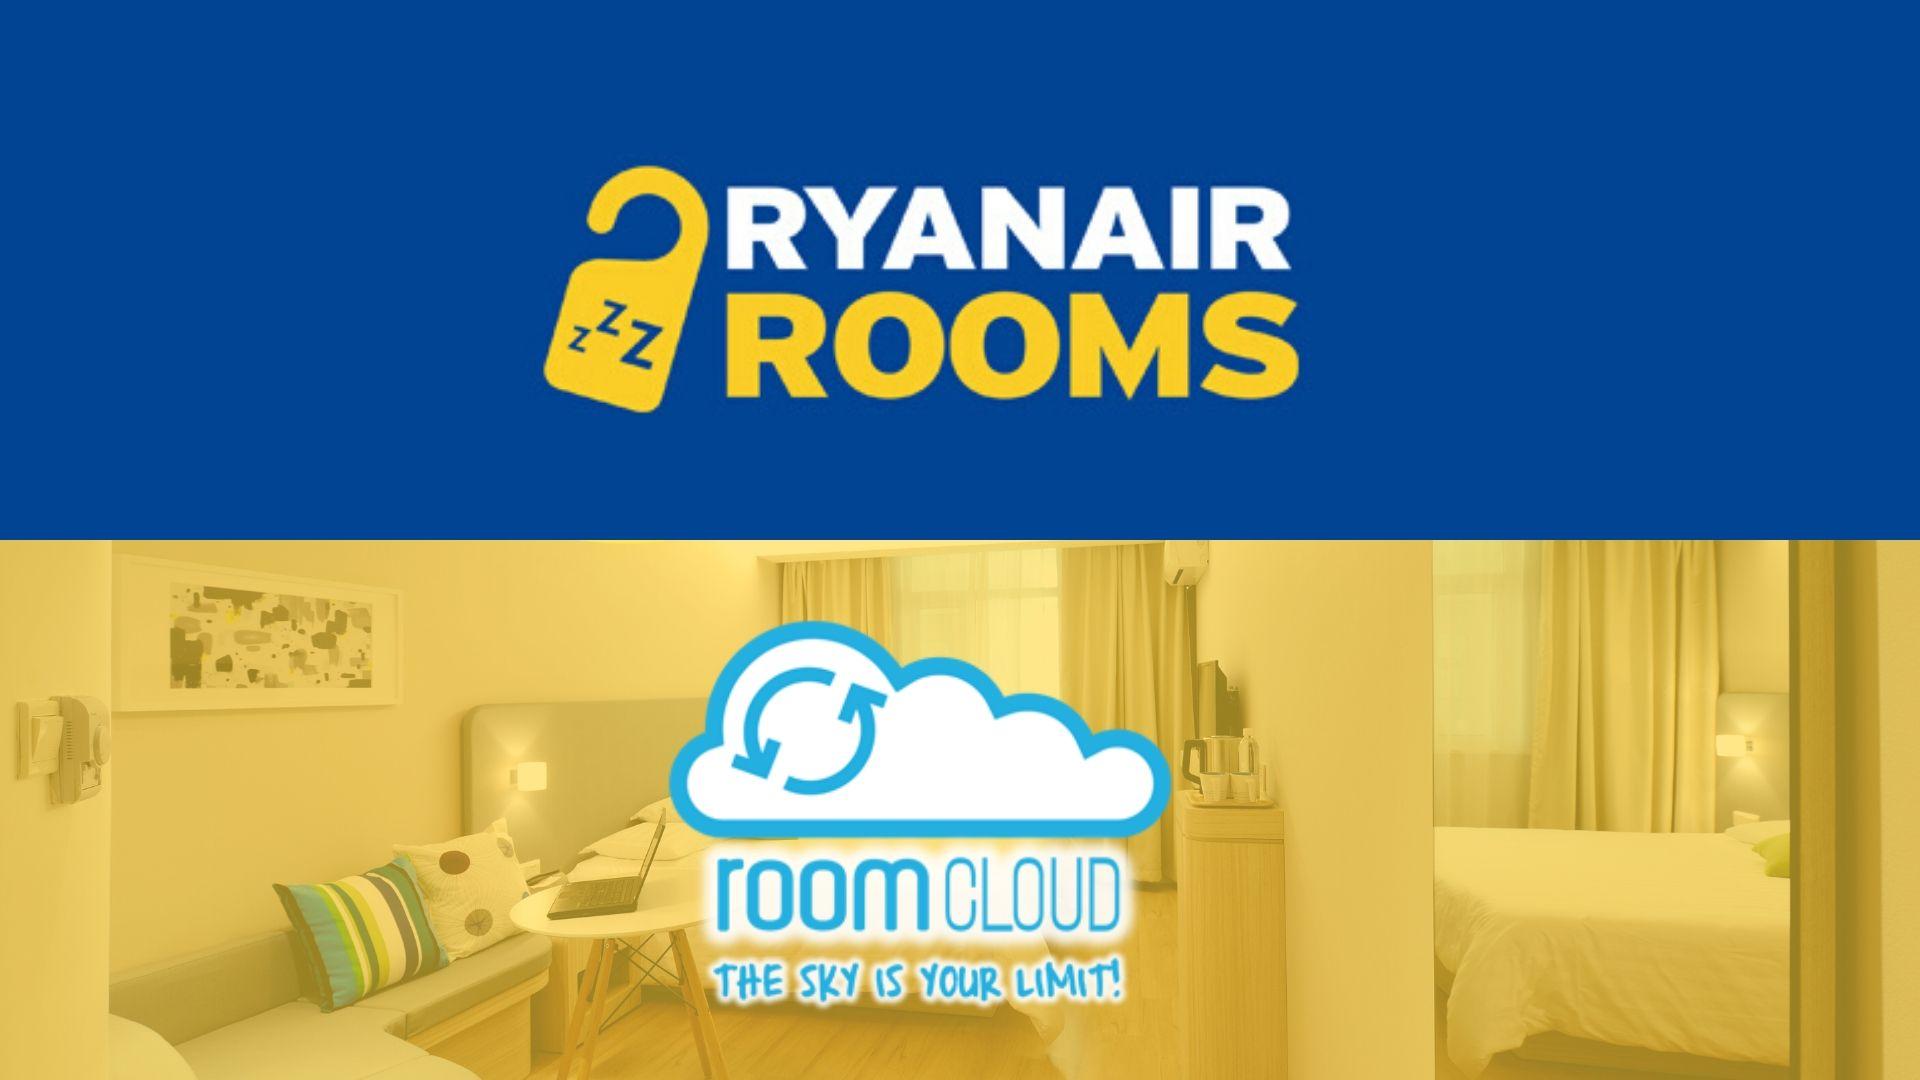 Ryanair Rooms